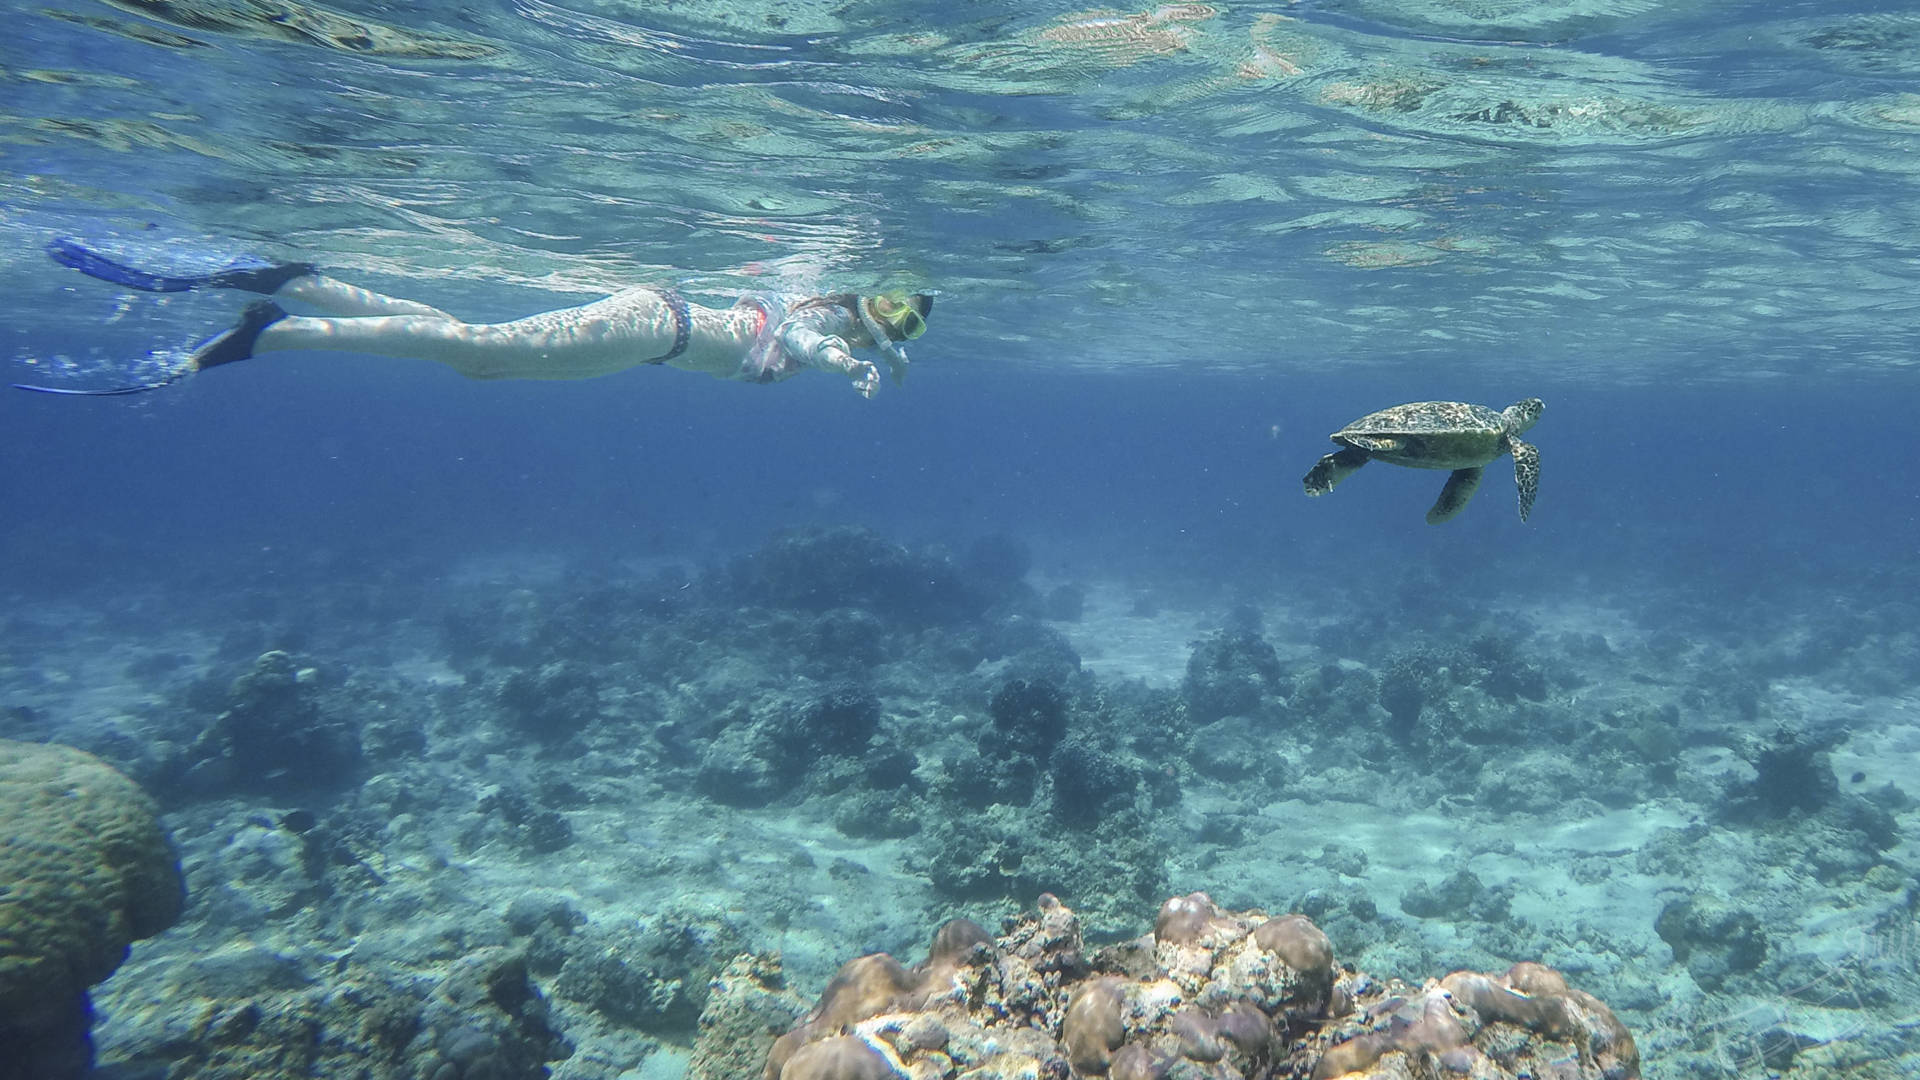 turtle gili meno, turtle snorkel meno, turtle indonesia, girl and turtle